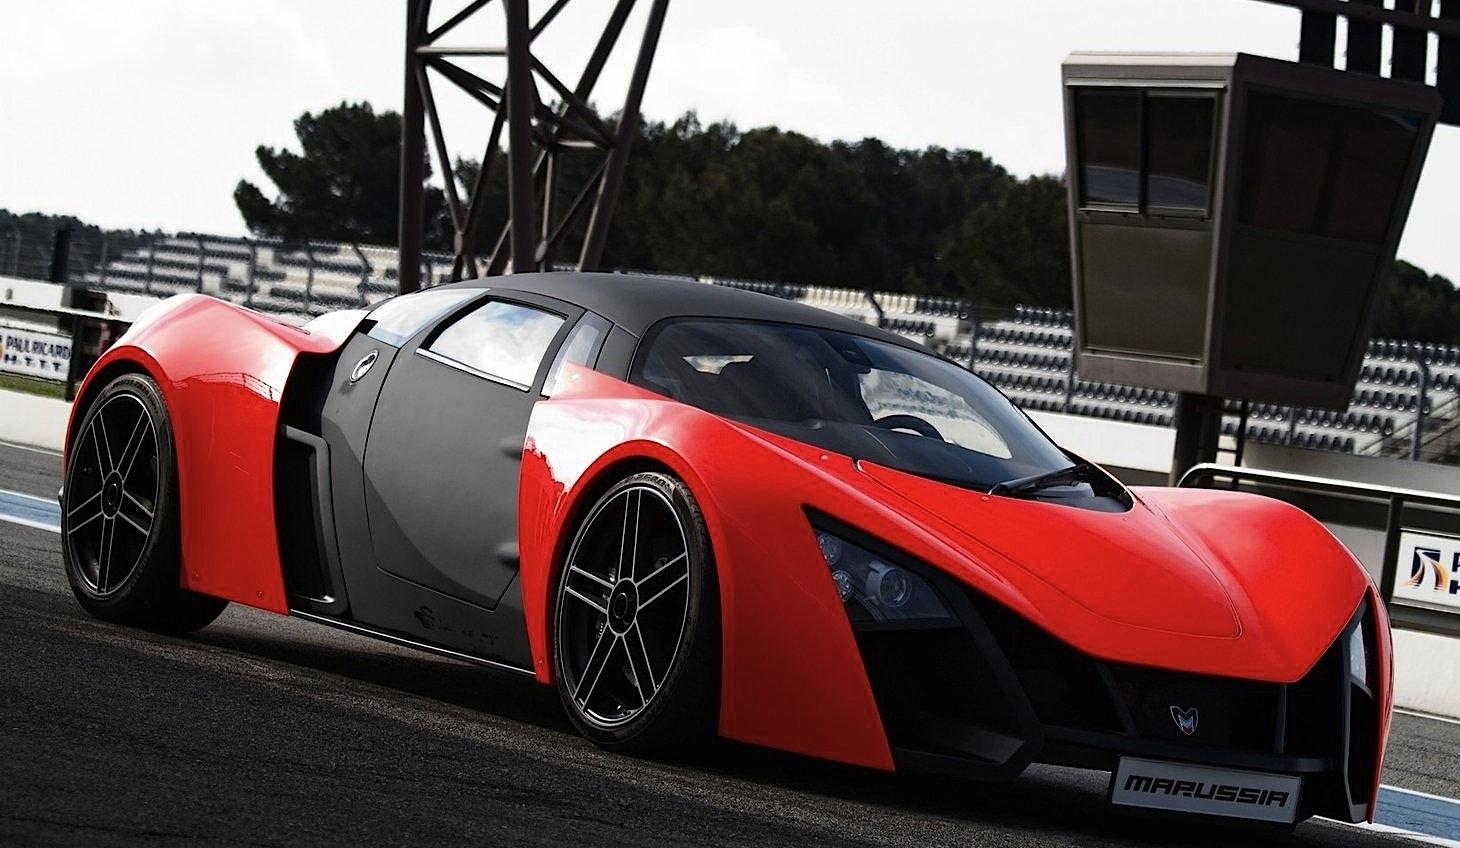 Sport car garage marussia b2 2012 for Garage auto b2